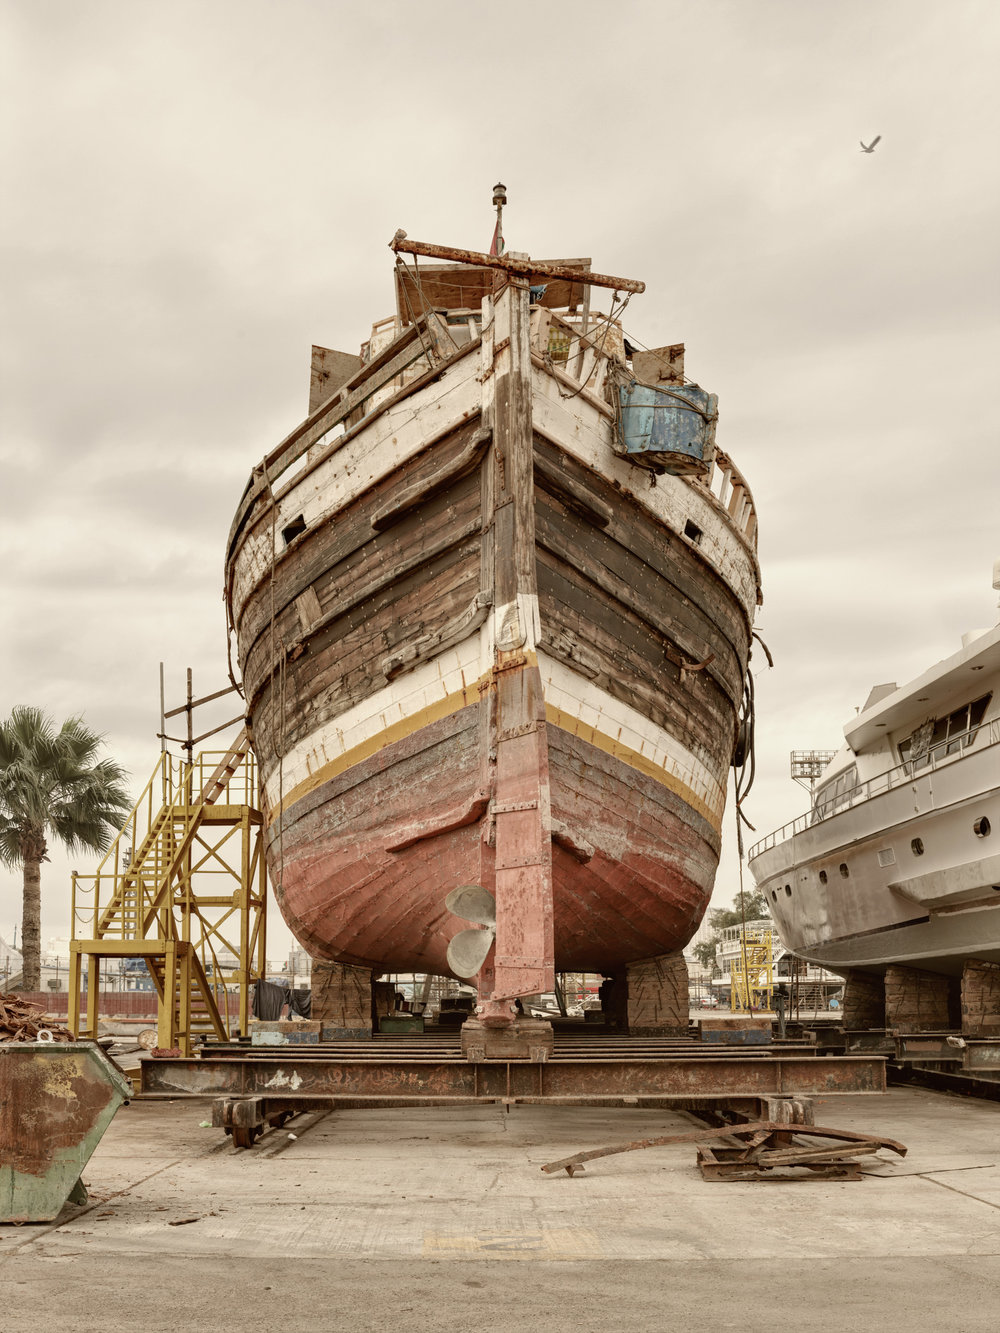 Ship II - Al Jaddaf Marine Dry Docks - Dubai 2017